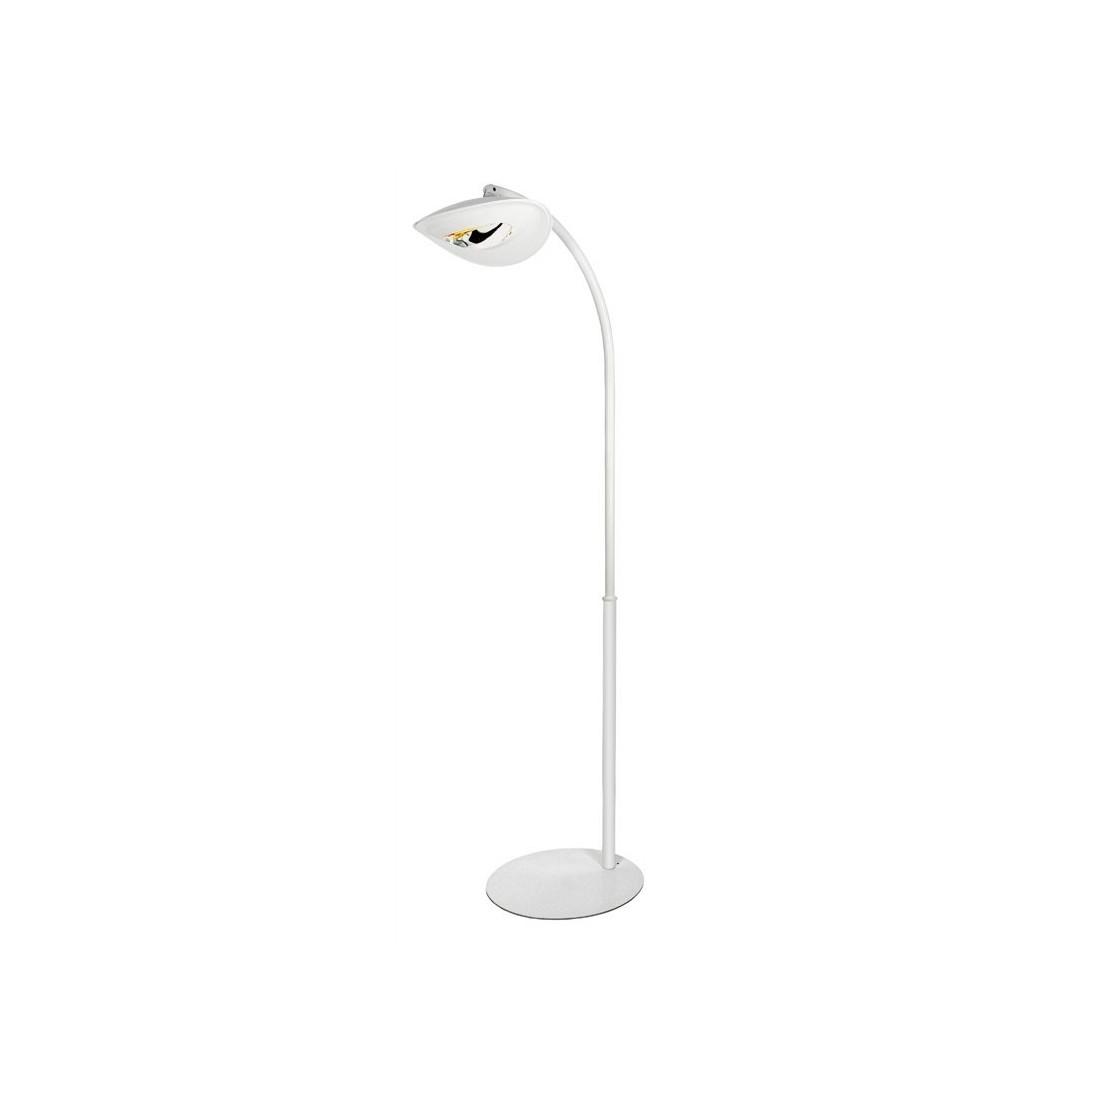 lampe chauffante infrarouge hotdoor lampadaire simple. Black Bedroom Furniture Sets. Home Design Ideas